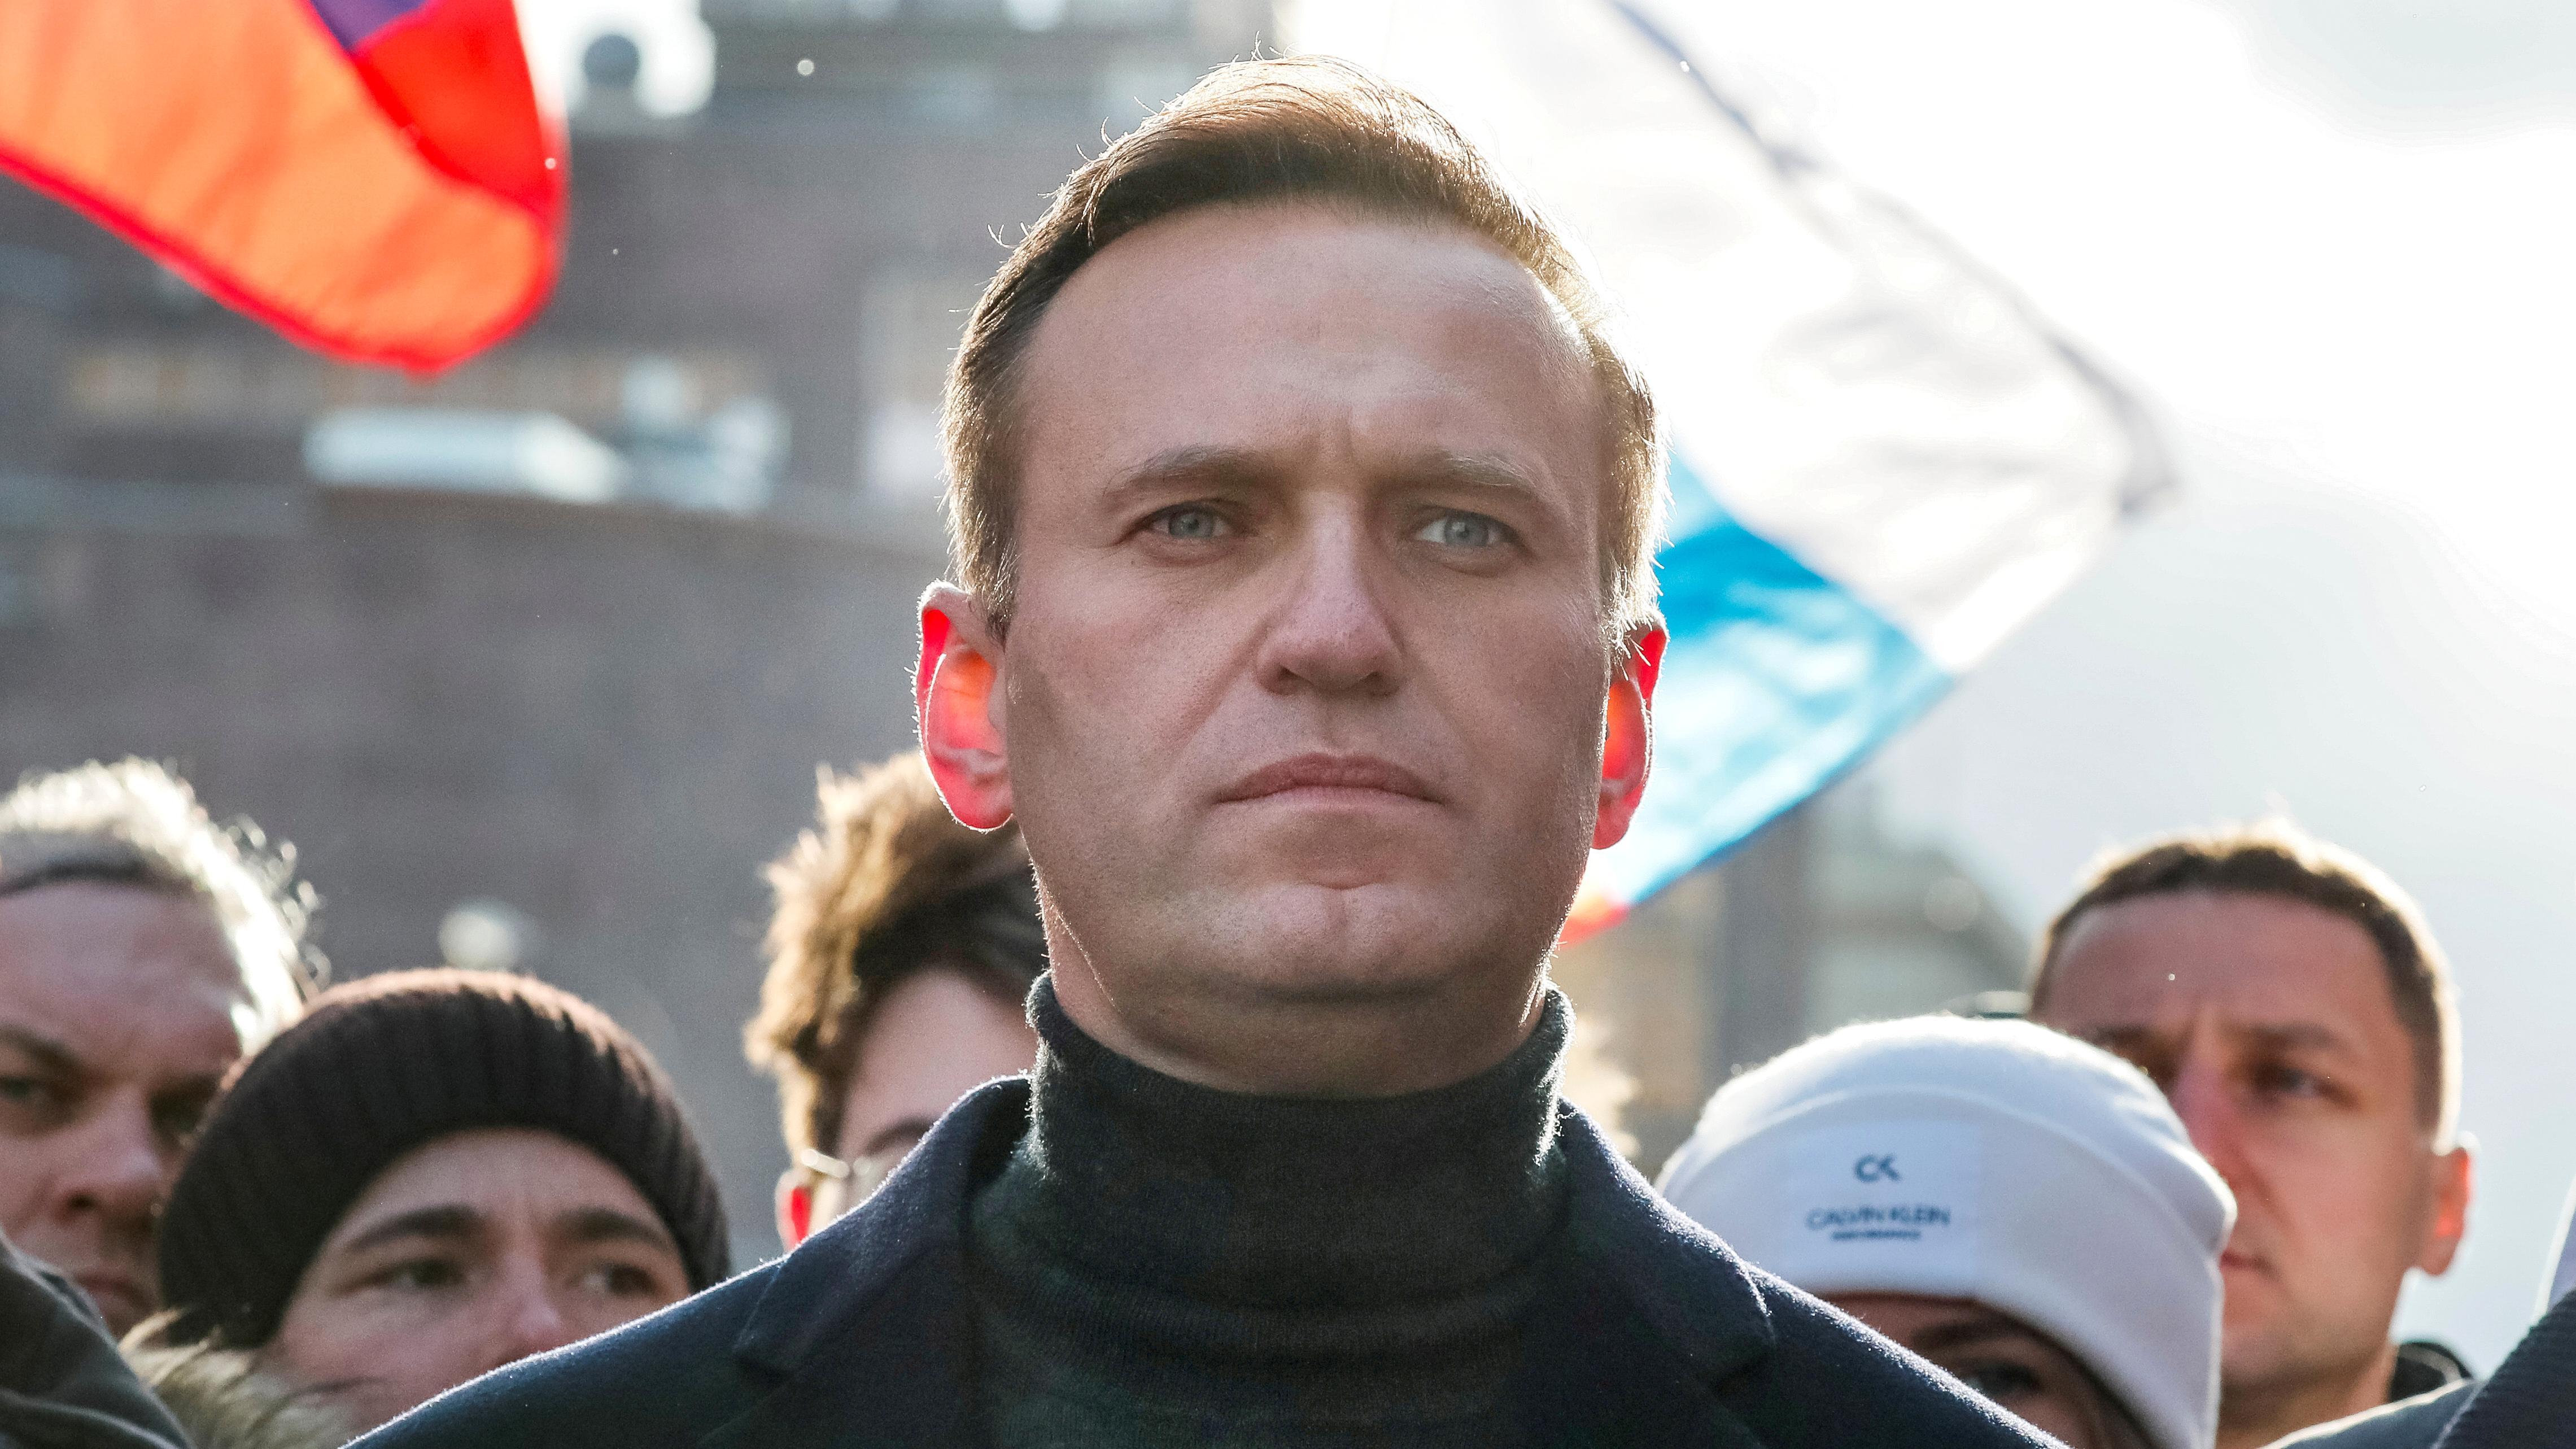 Alexej Nawalny Alexei Navalny